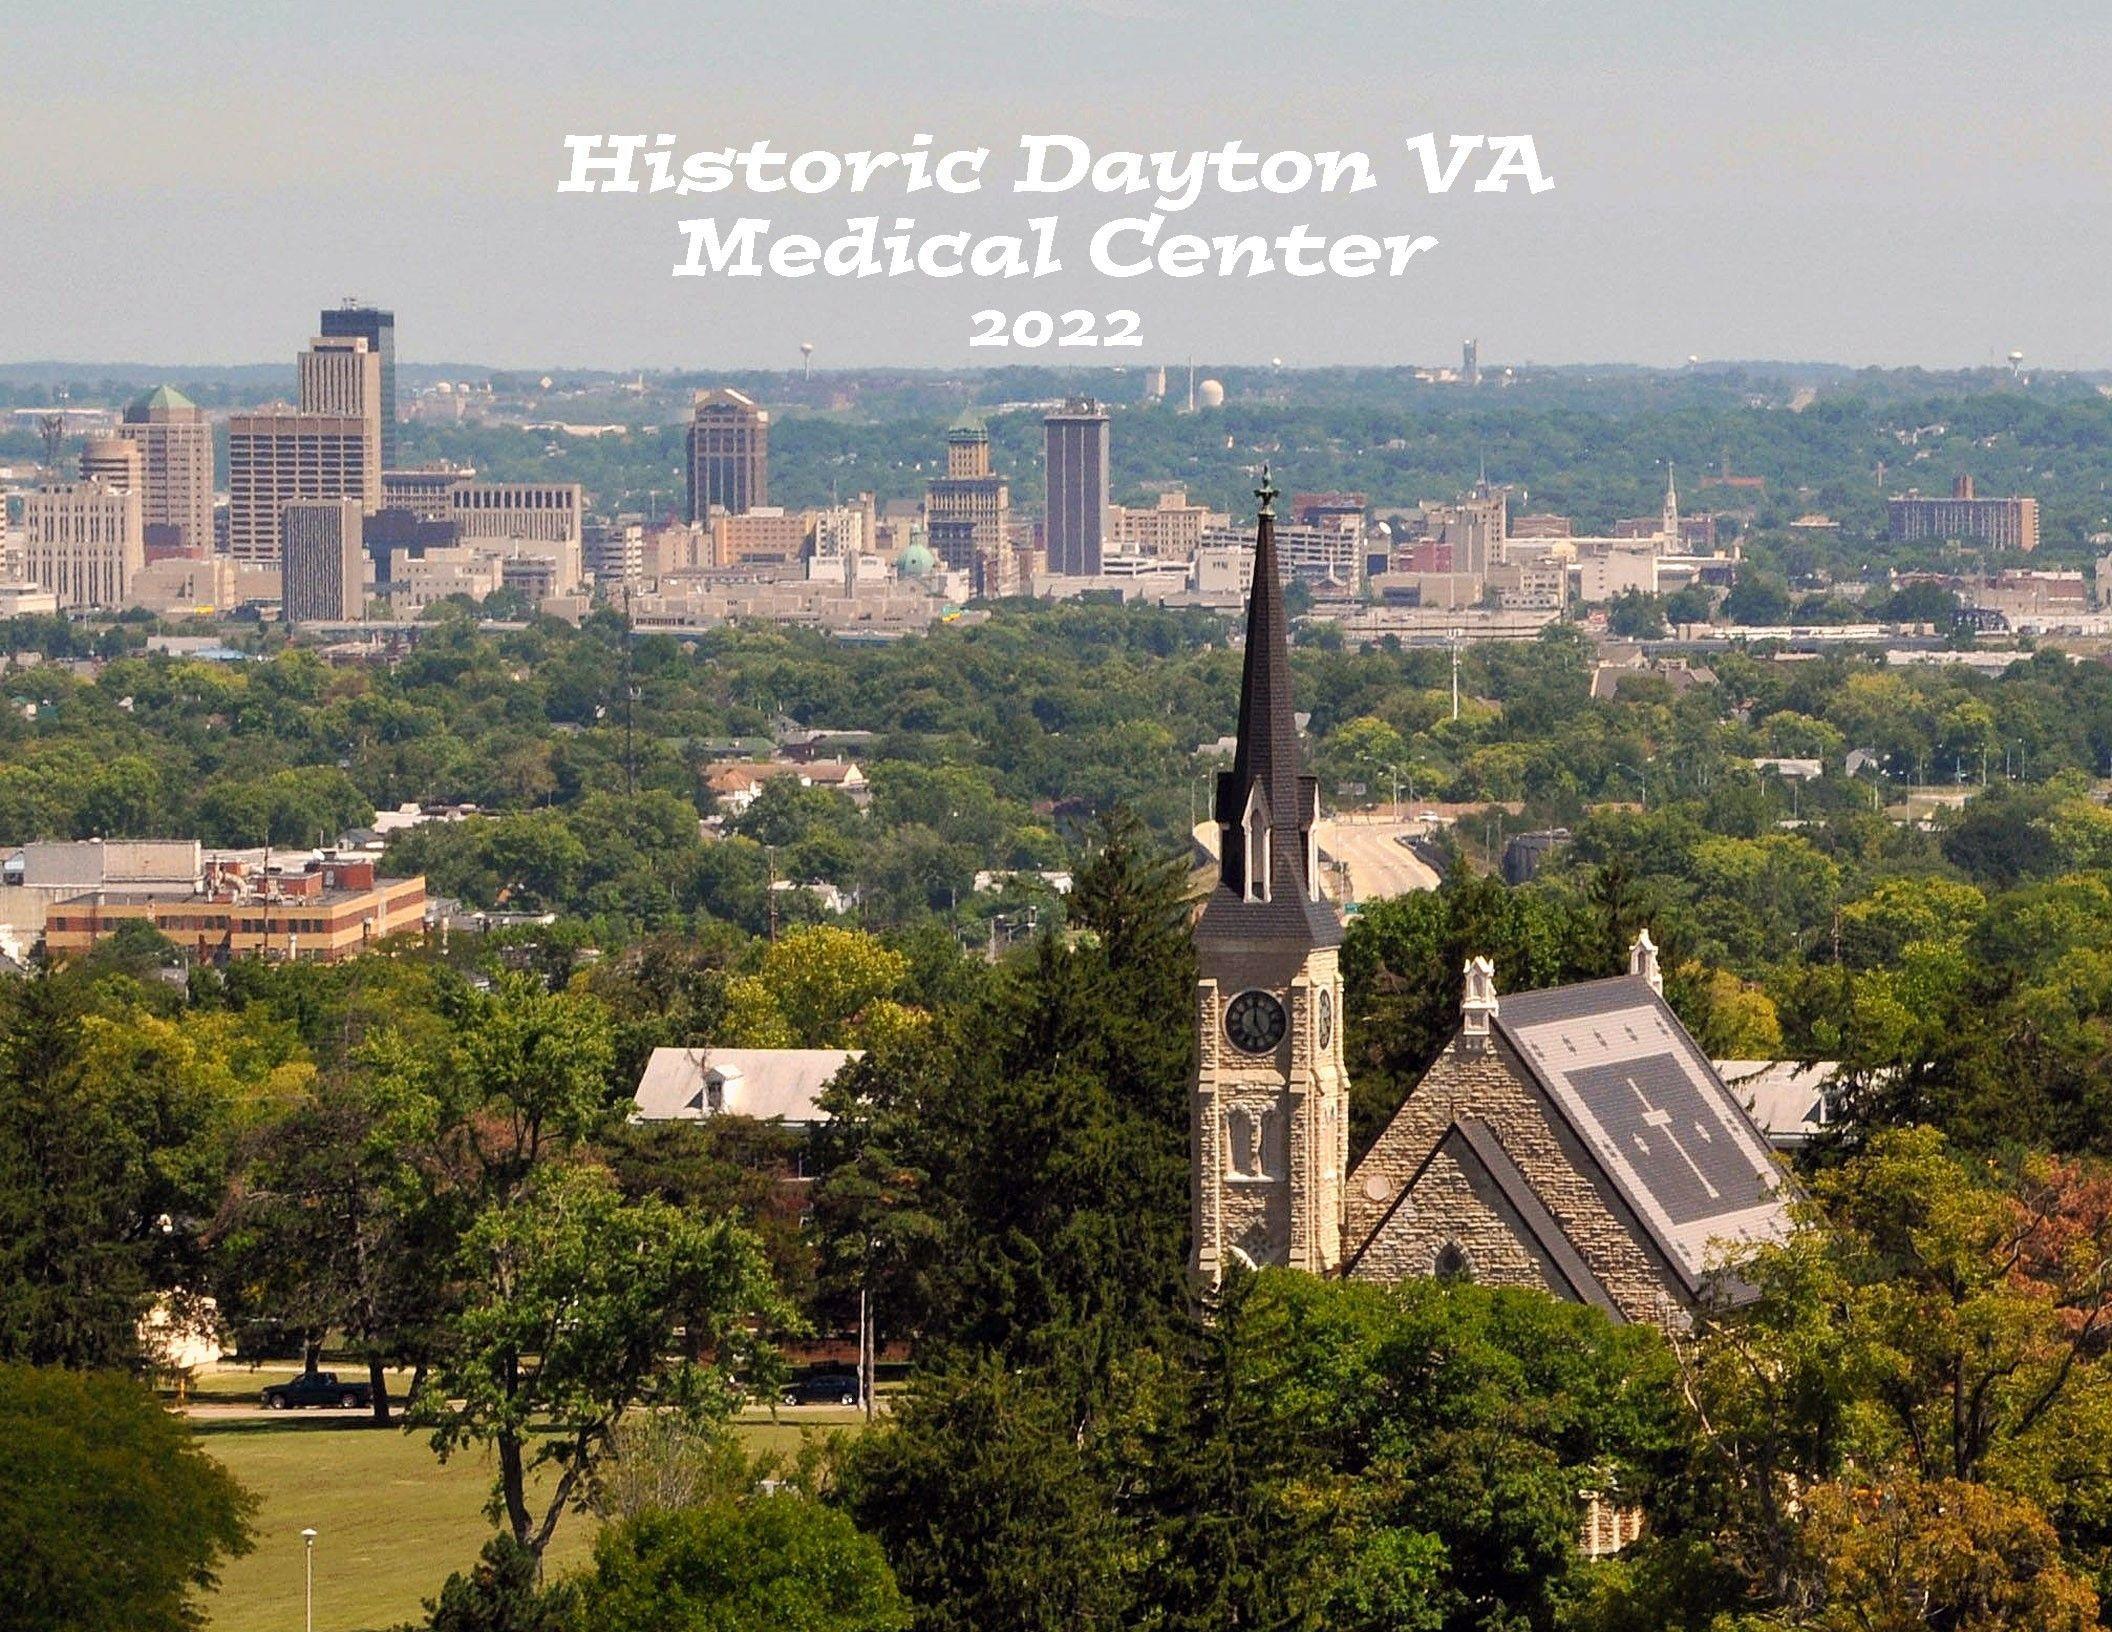 Historic Dayton VA Calendars are now available.